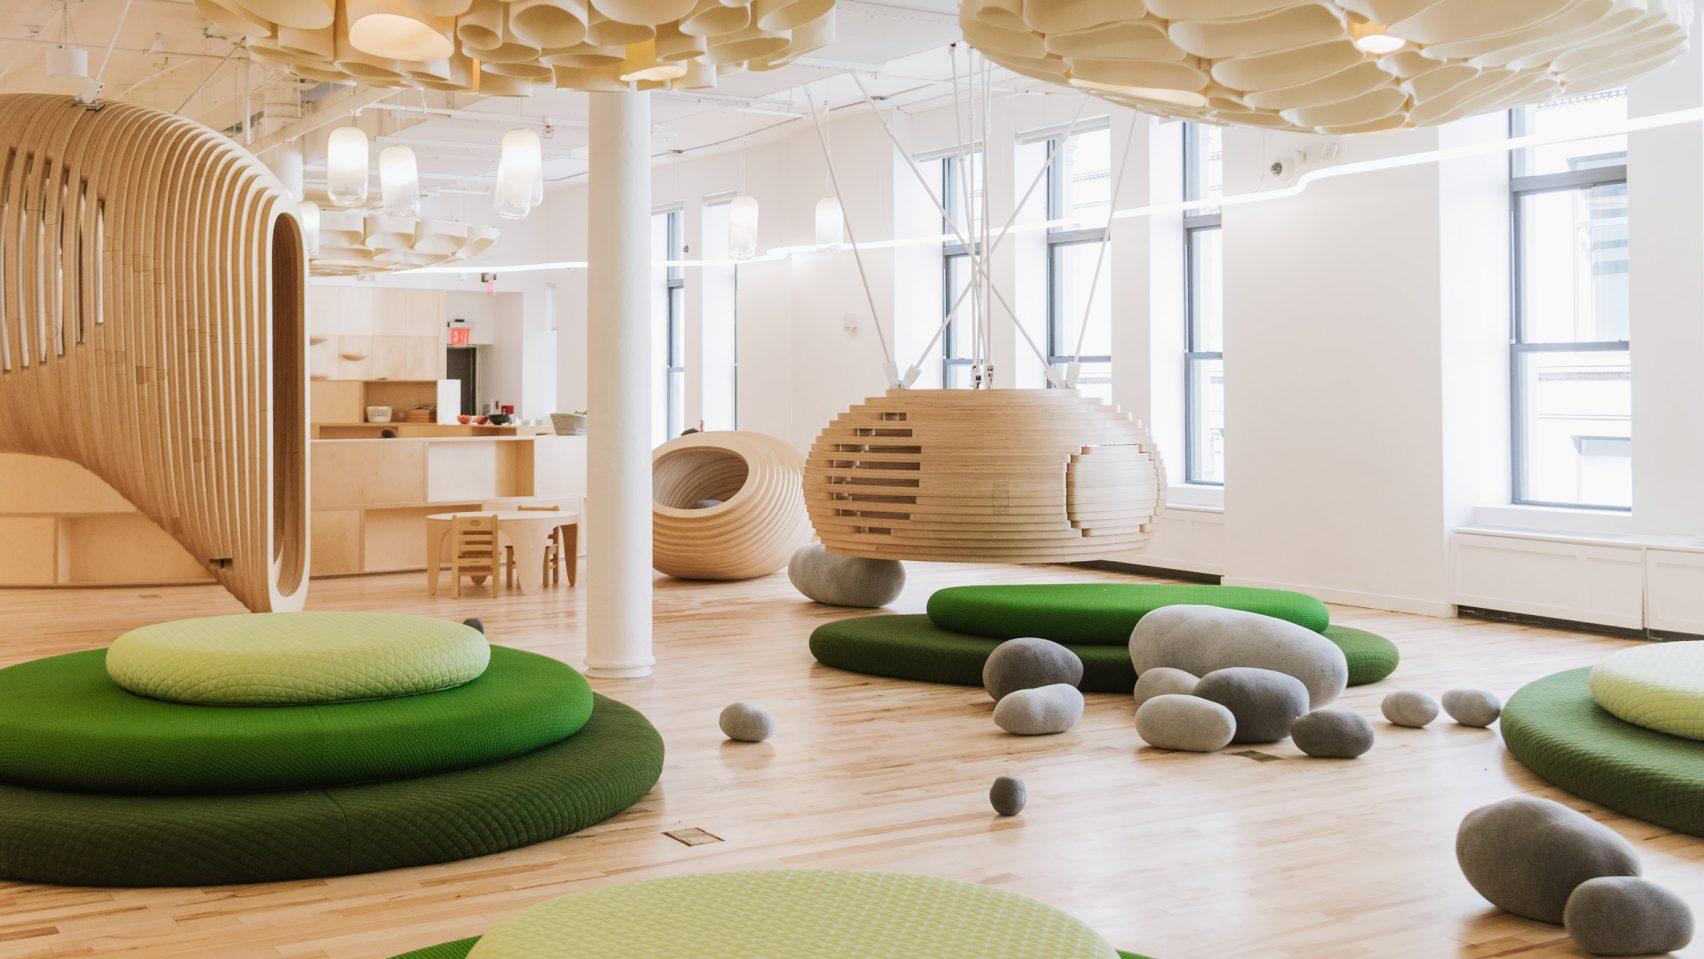 See Inside Wework 39 S First Elementary School In Nyc Designed By Bjarke Ingels 6sqft